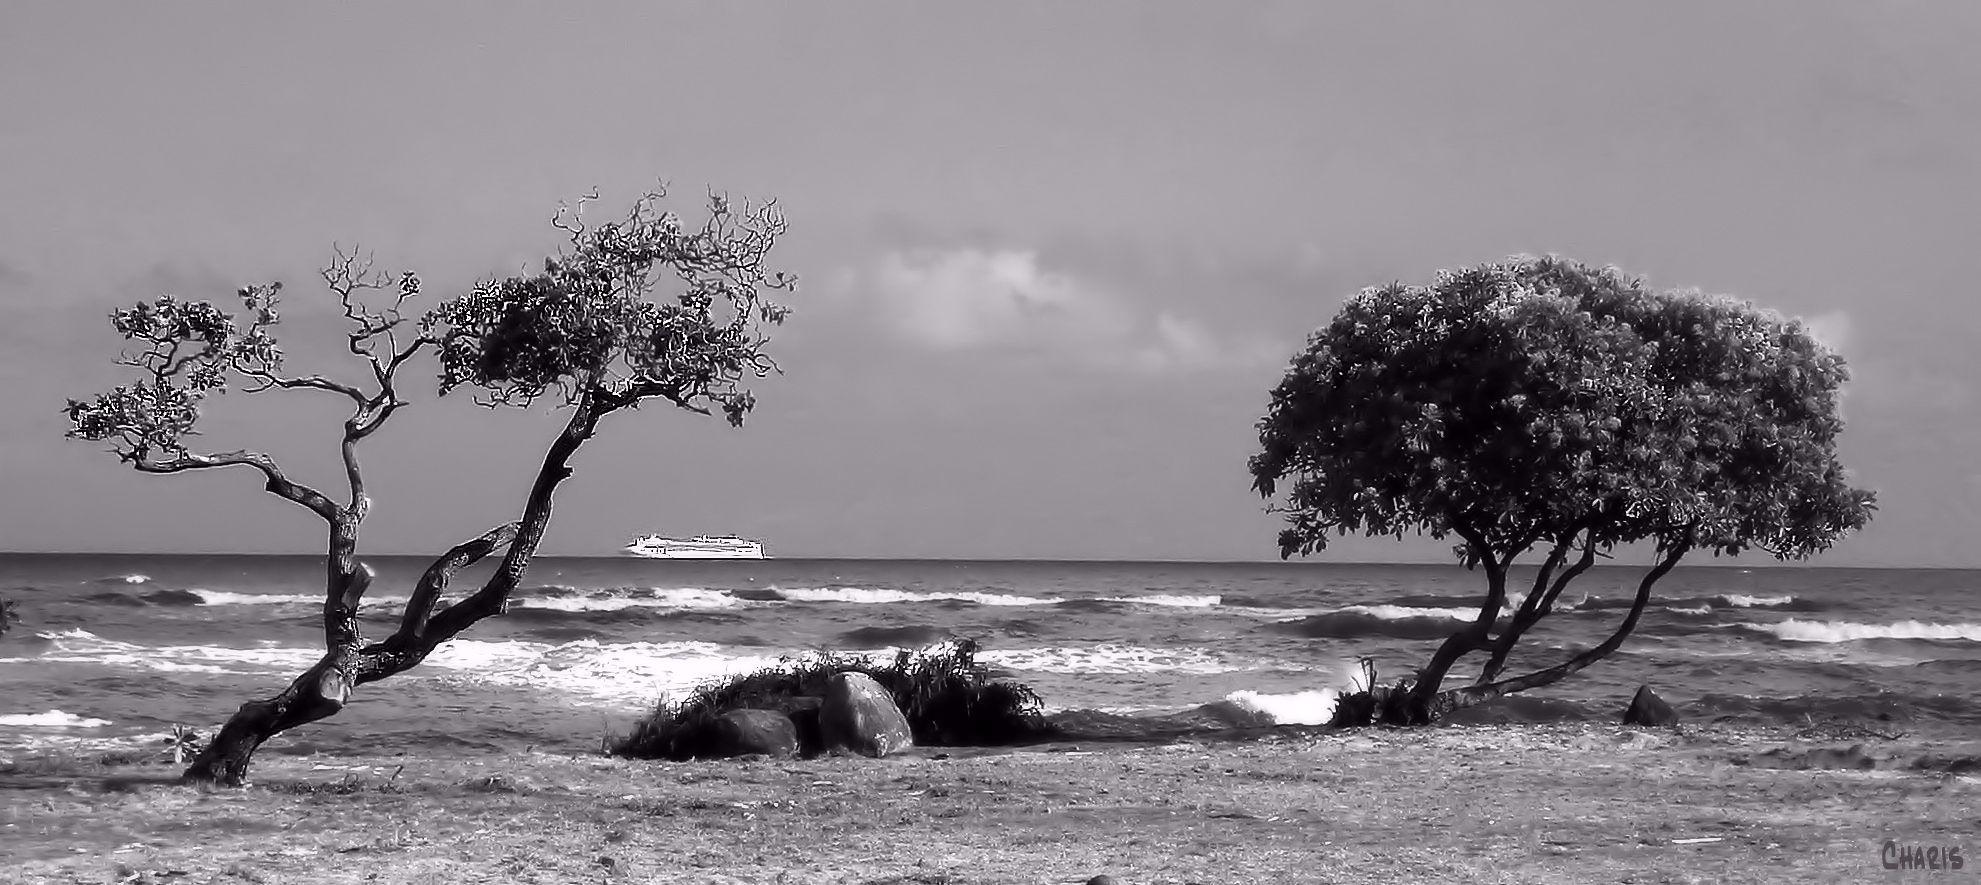 The view from Kauai